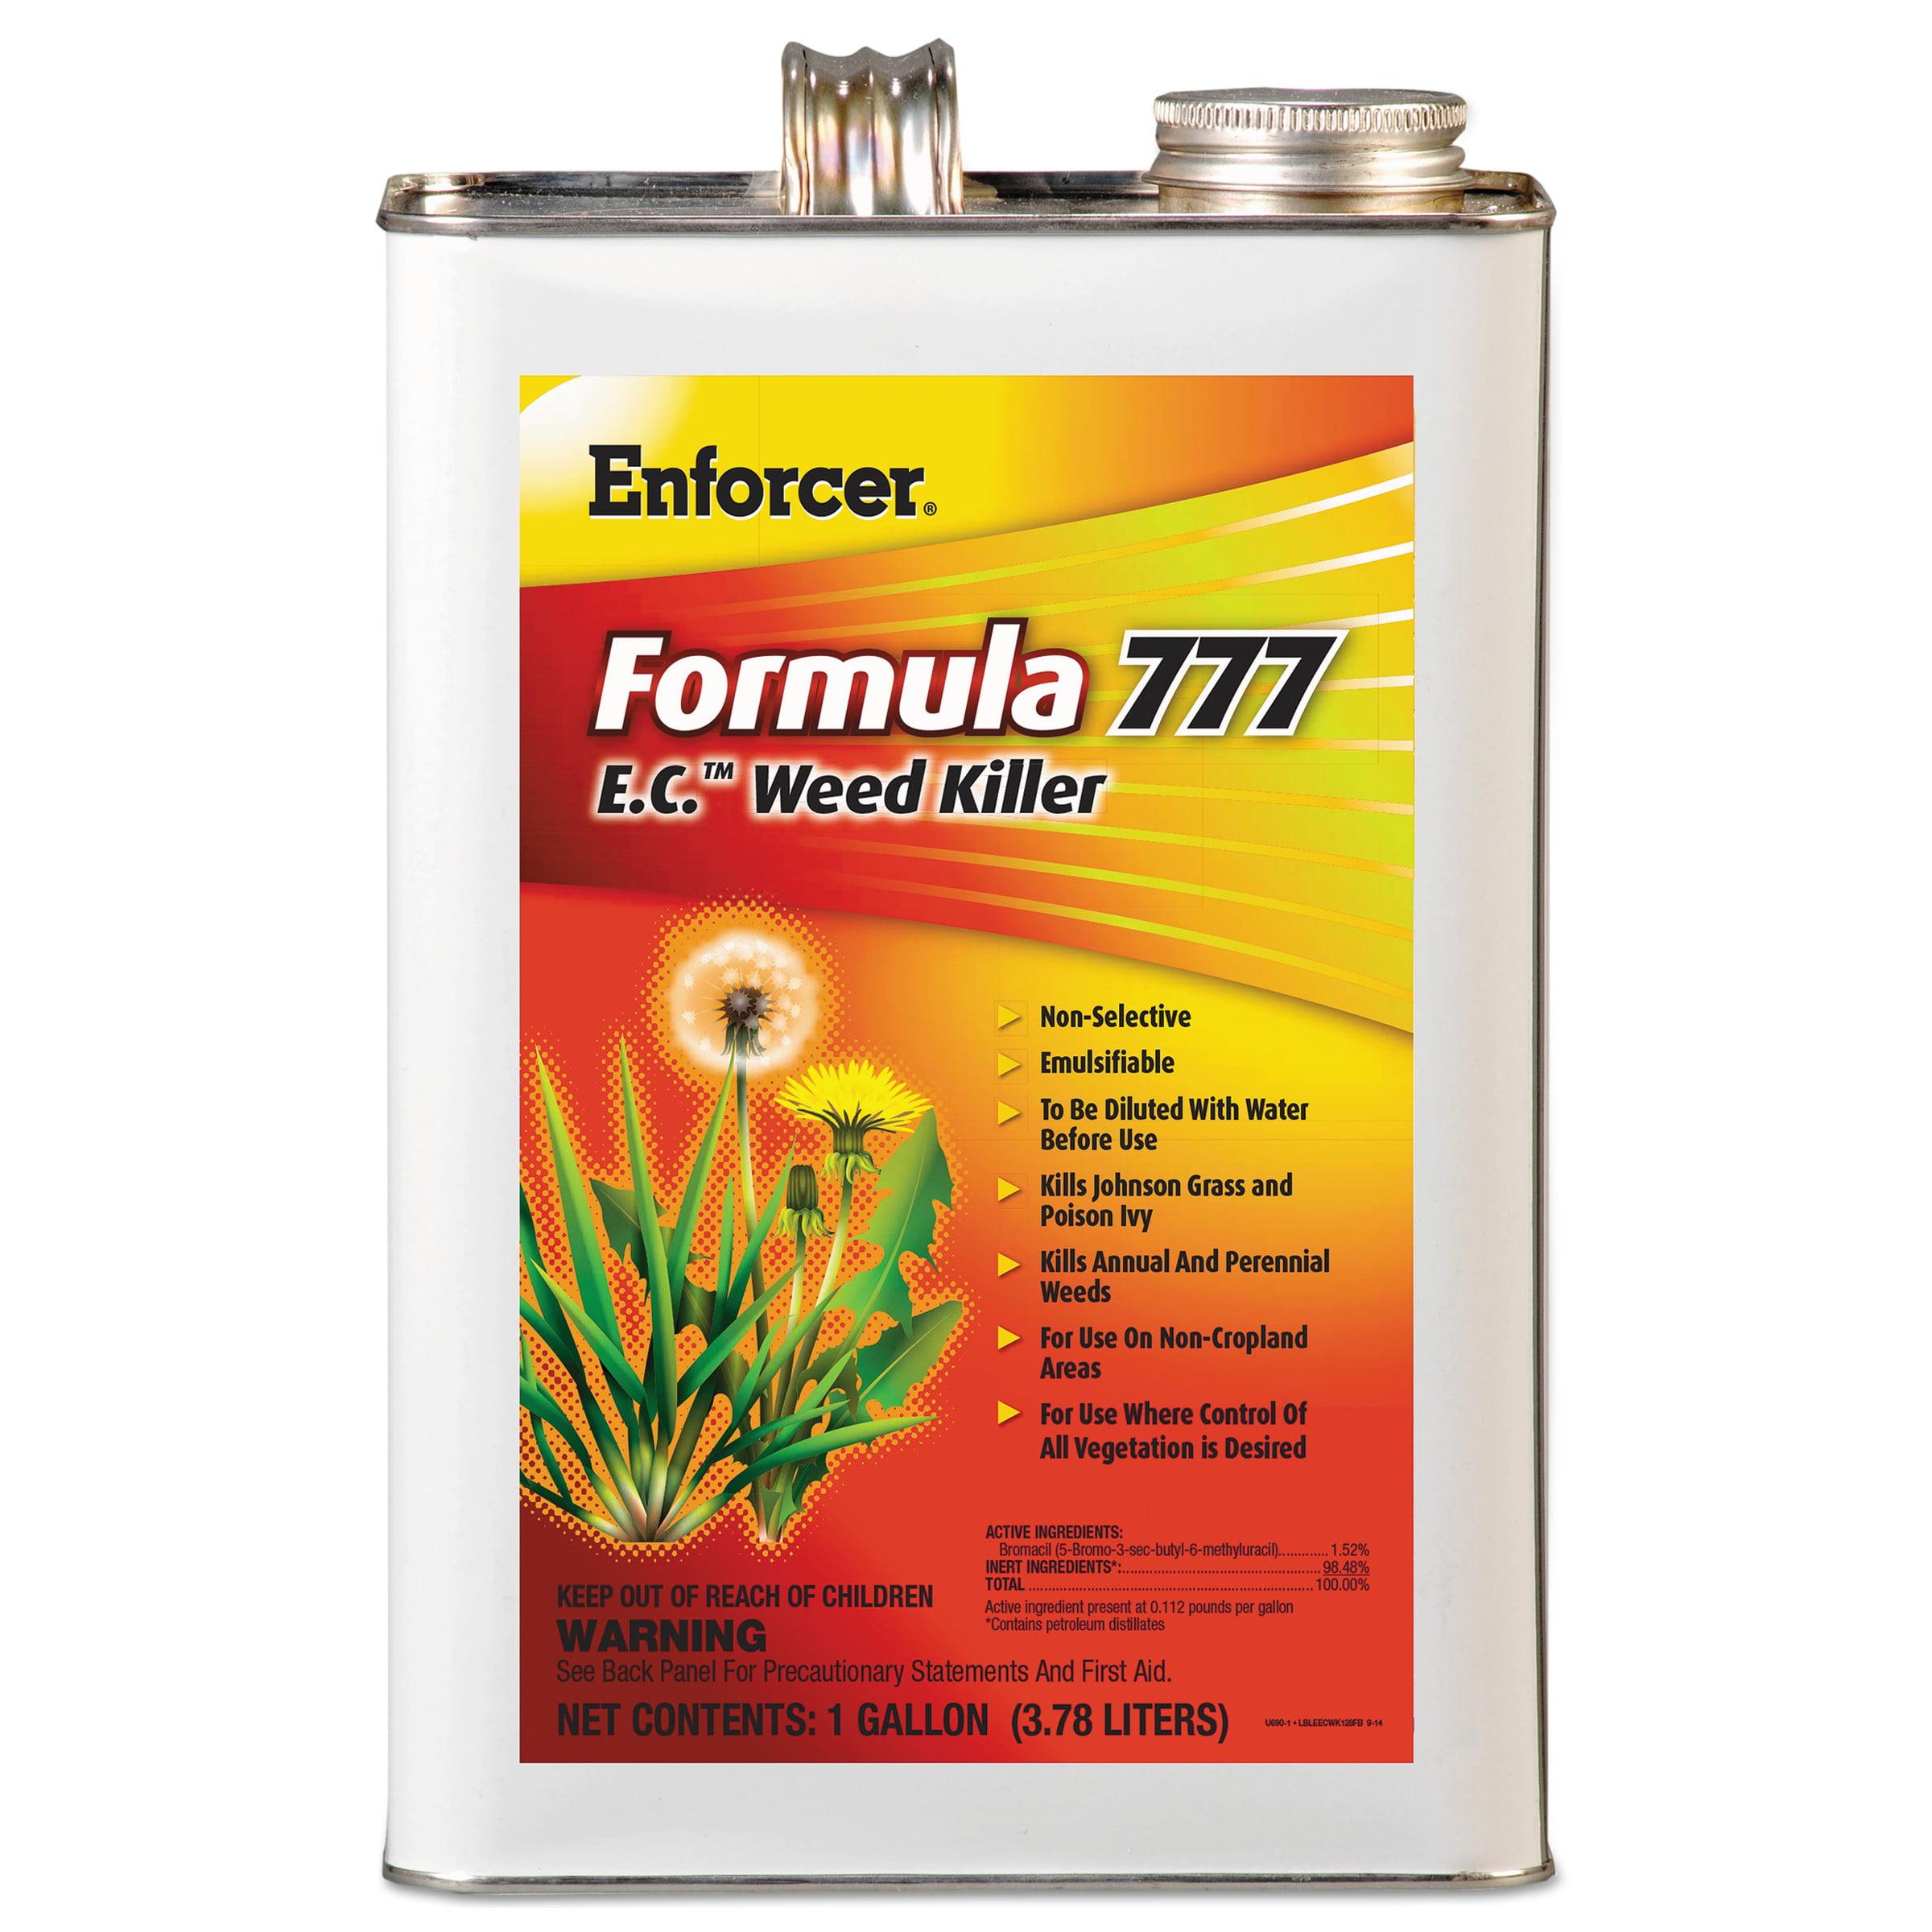 Waterbury Companies 1048550 Formula 777 E.c. Weed Killer, Non-cropland, 1 Gal Can, 4/carton